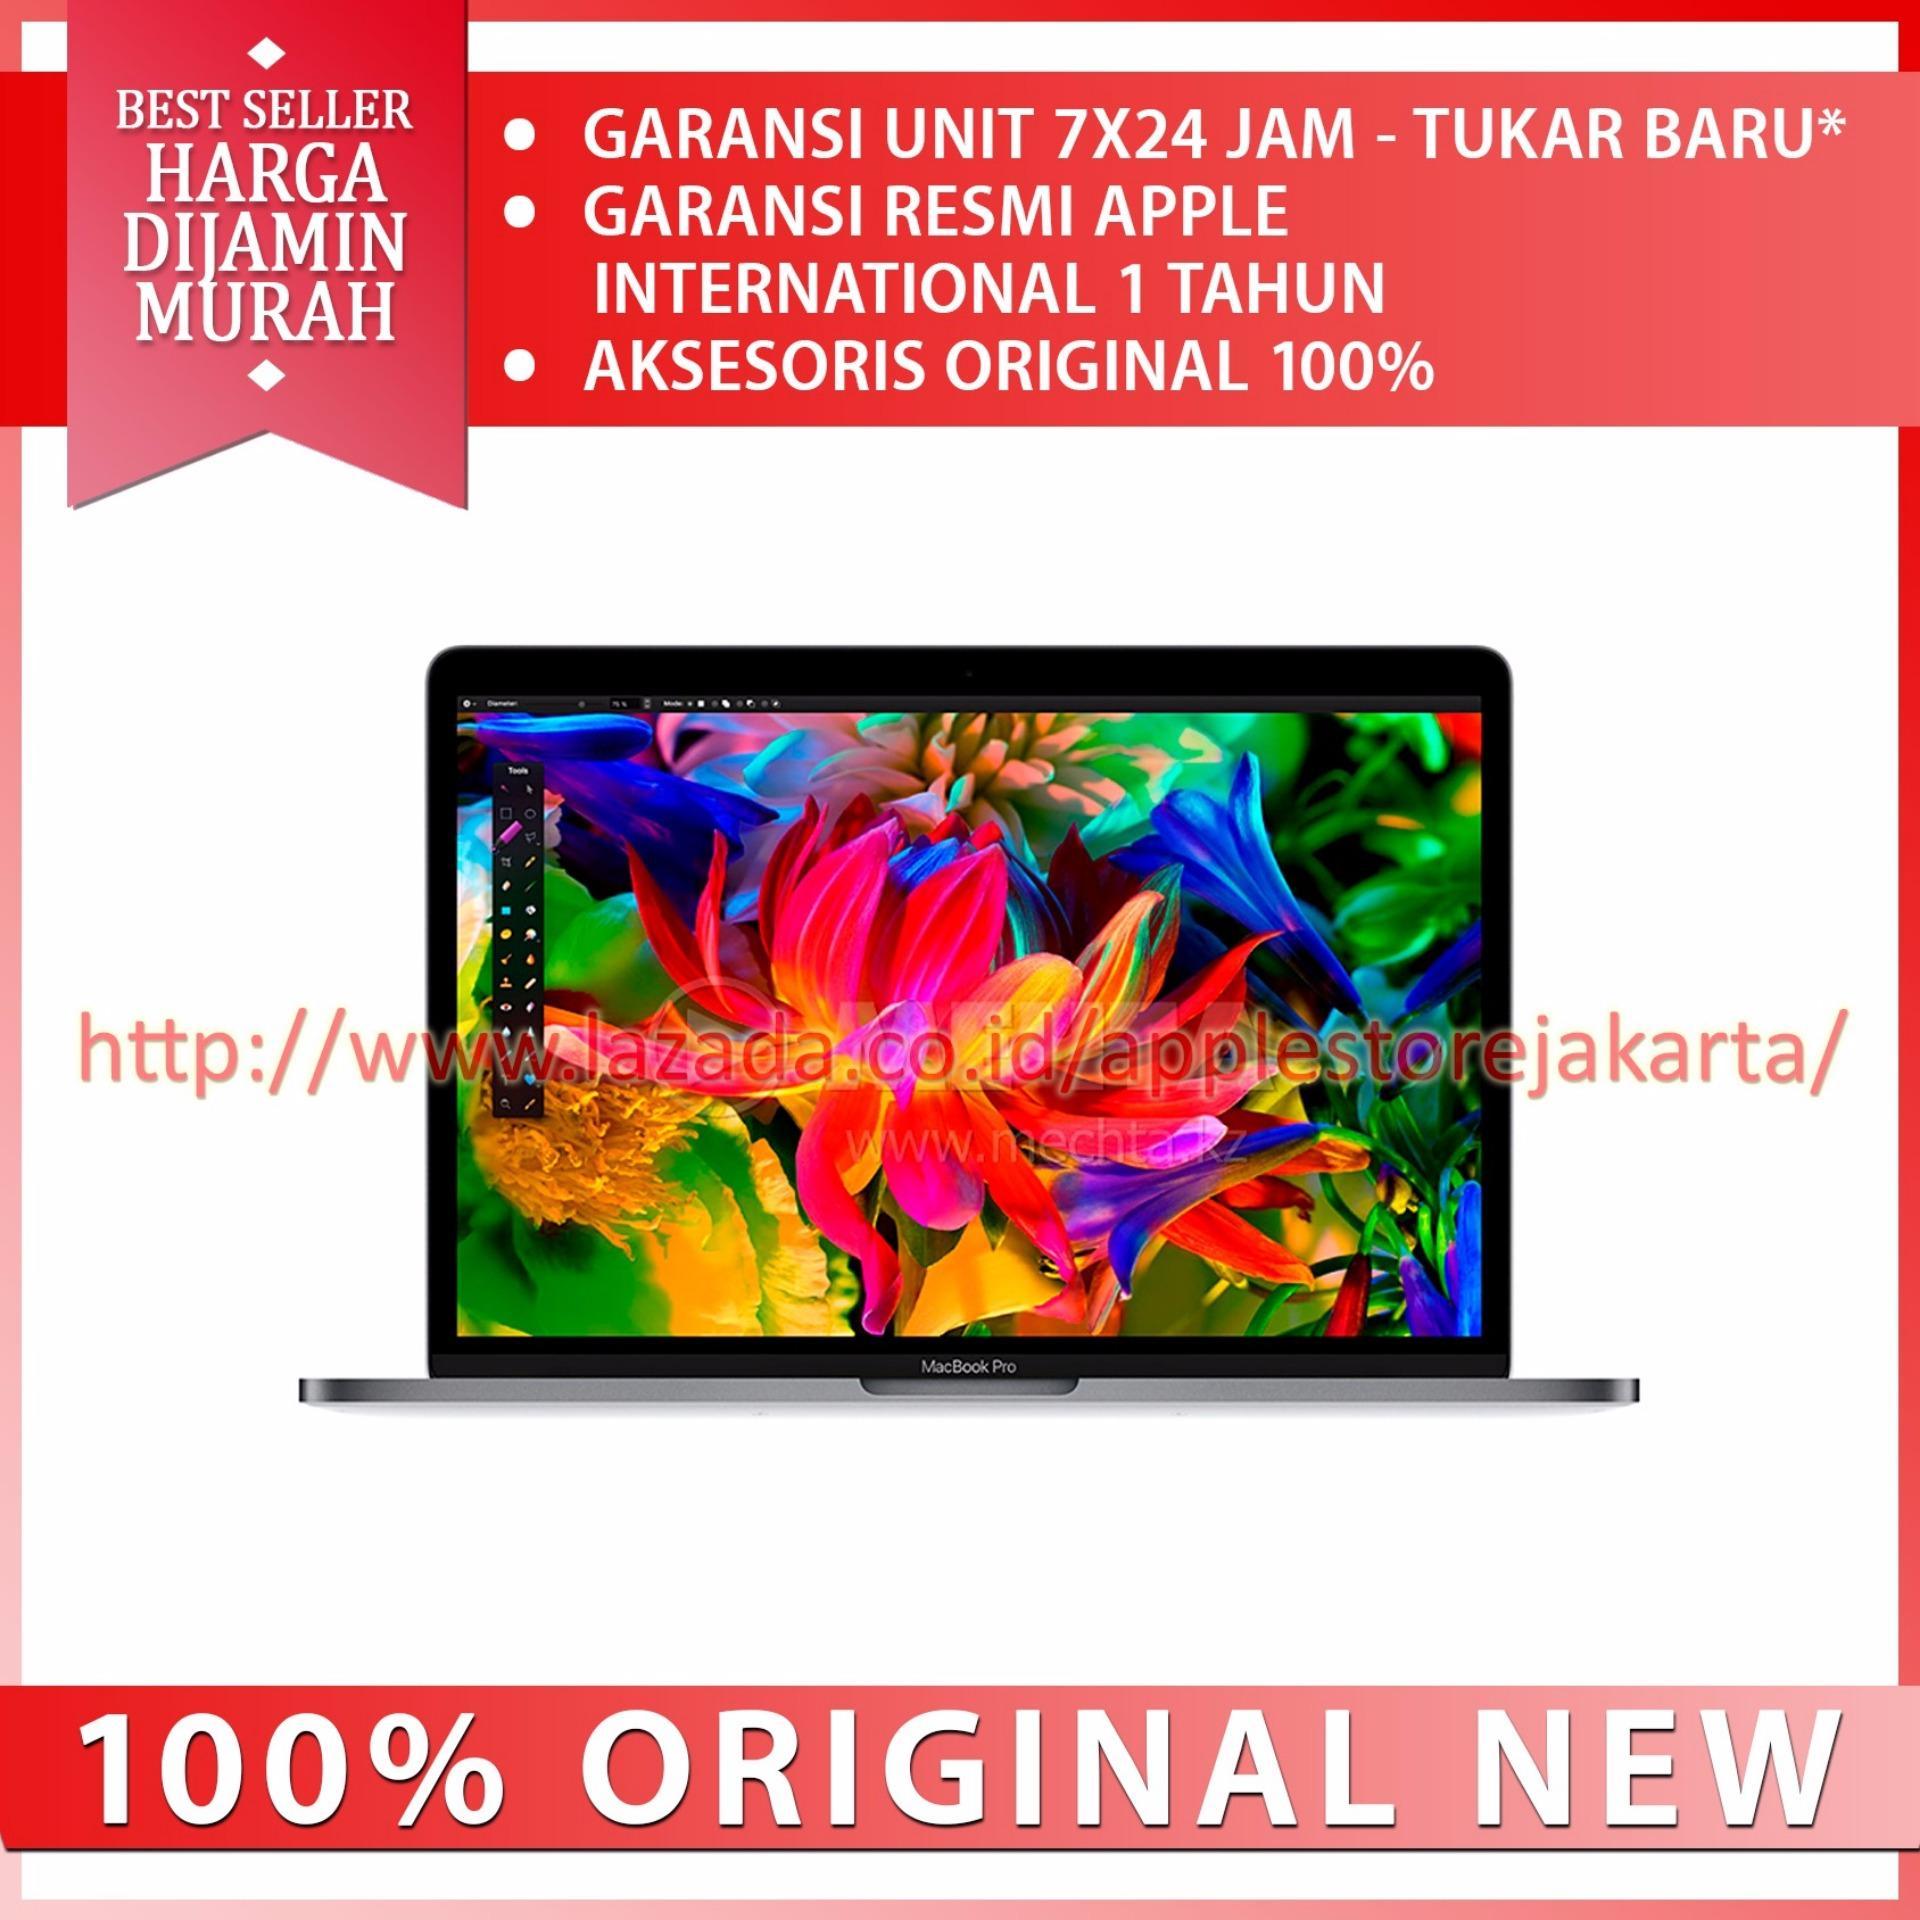 Mll42 Info Harga Berbagai Produk Terbaik Tas Laptop Sleeve Softcase New Macbook Pro Air Retina 116 154 Inch Apple 13 I5 20ghz 8gb 256gb